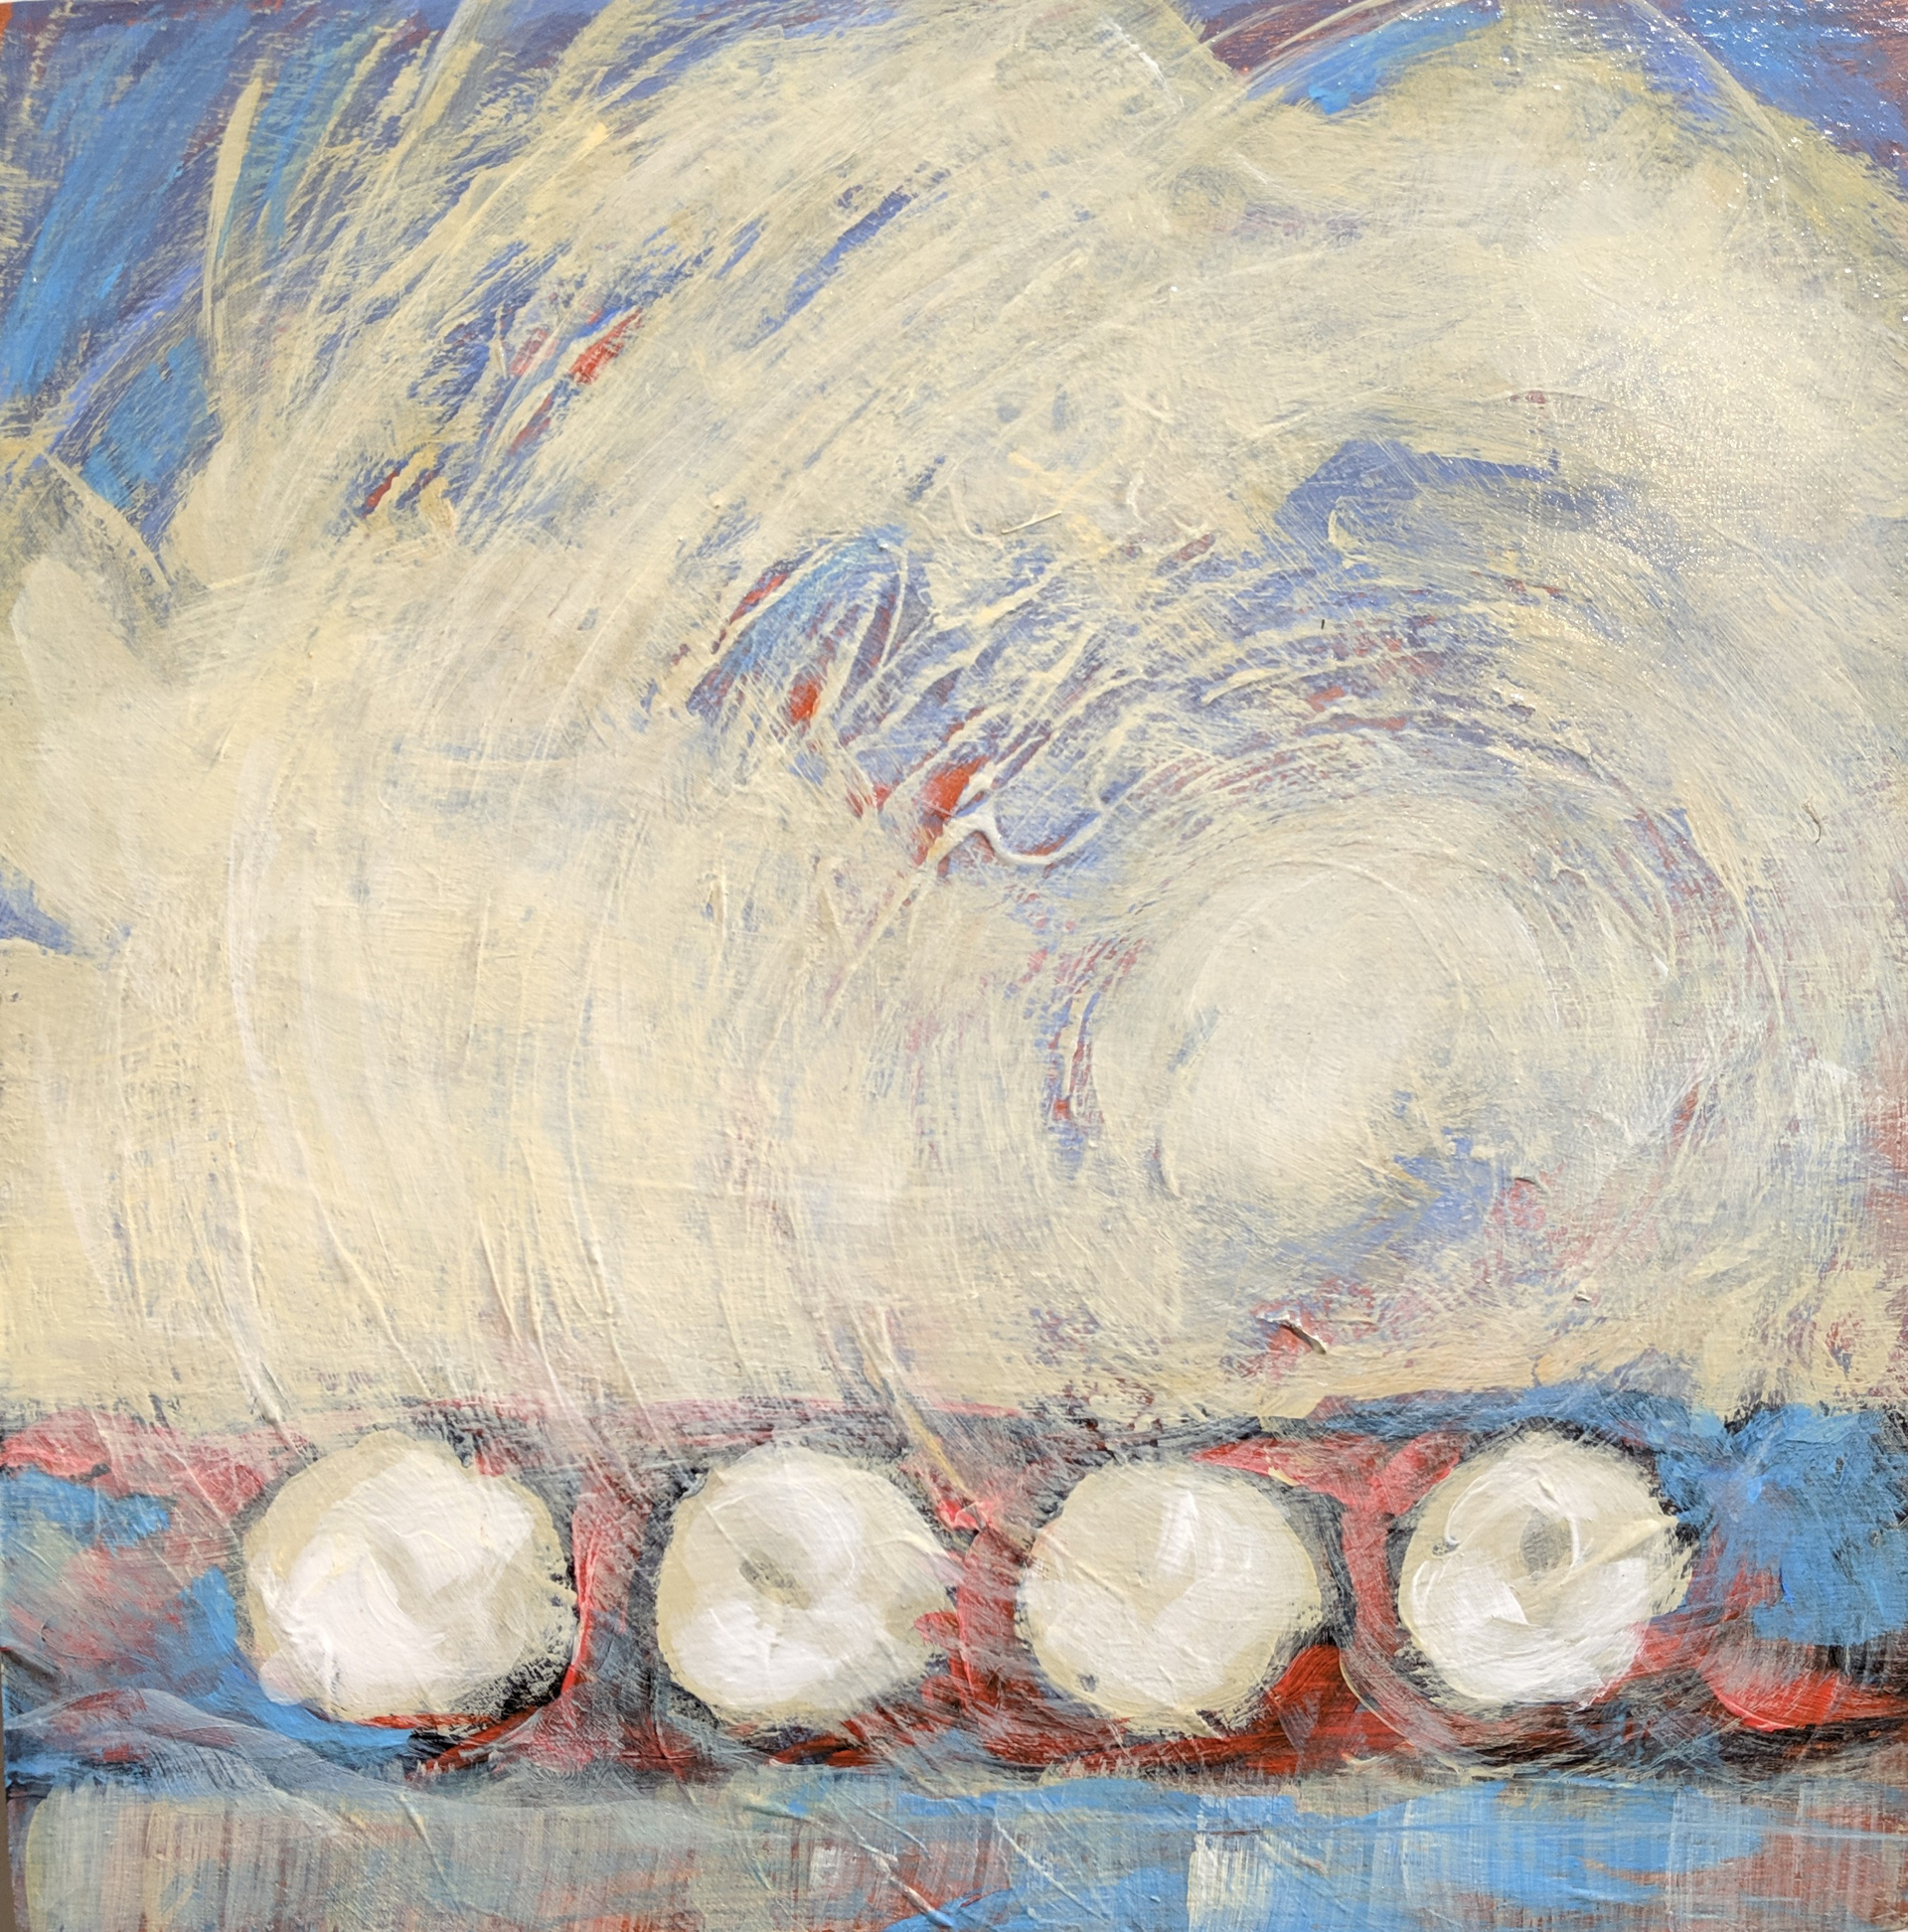 Four by Helen Bellaver